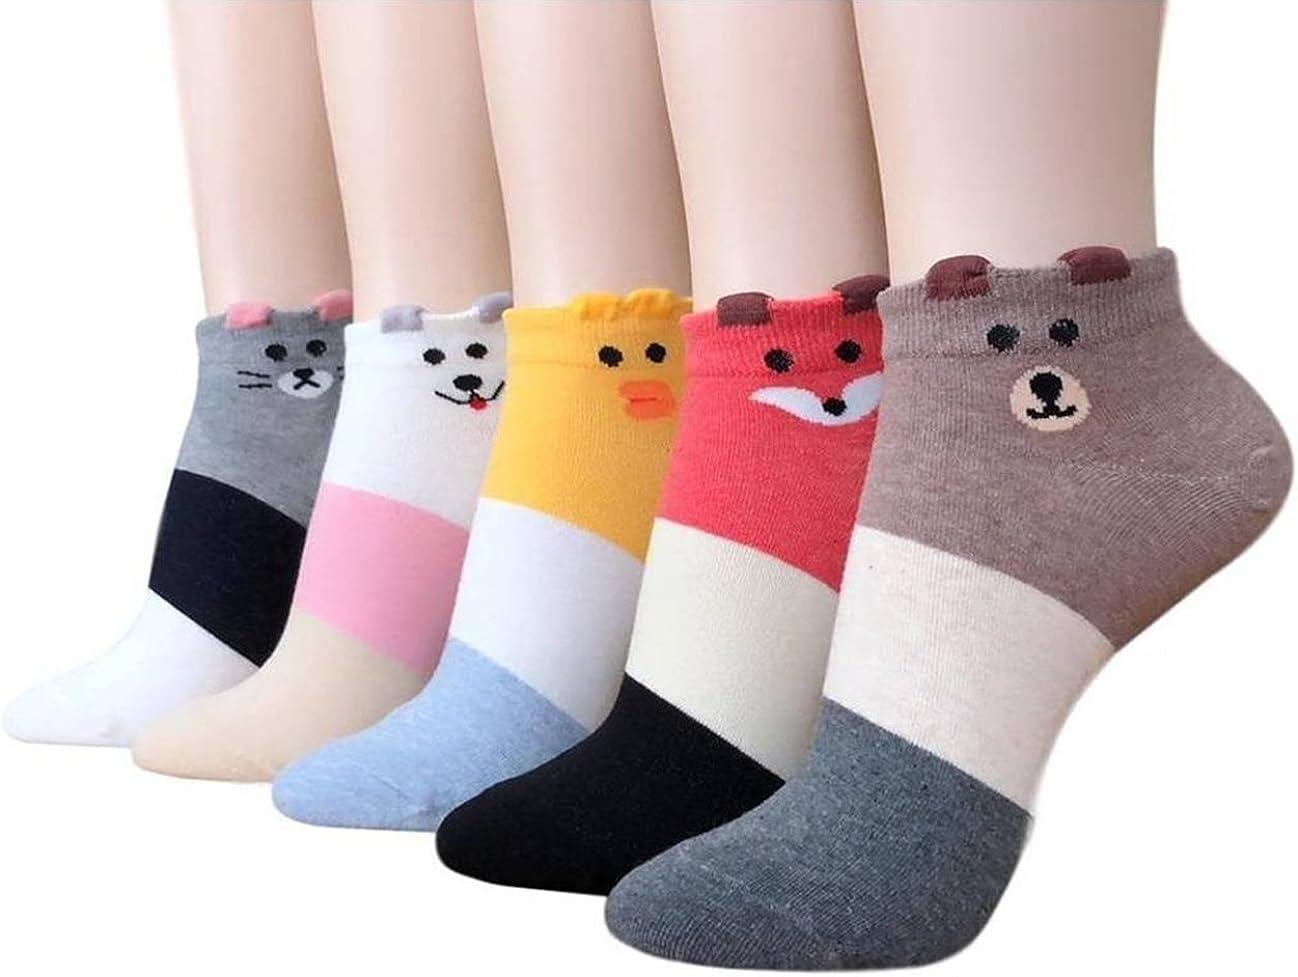 Ladys Womens Cotton Crew Socks Funny Animal Rabbit Cat Fruit Novelty Dress Socks